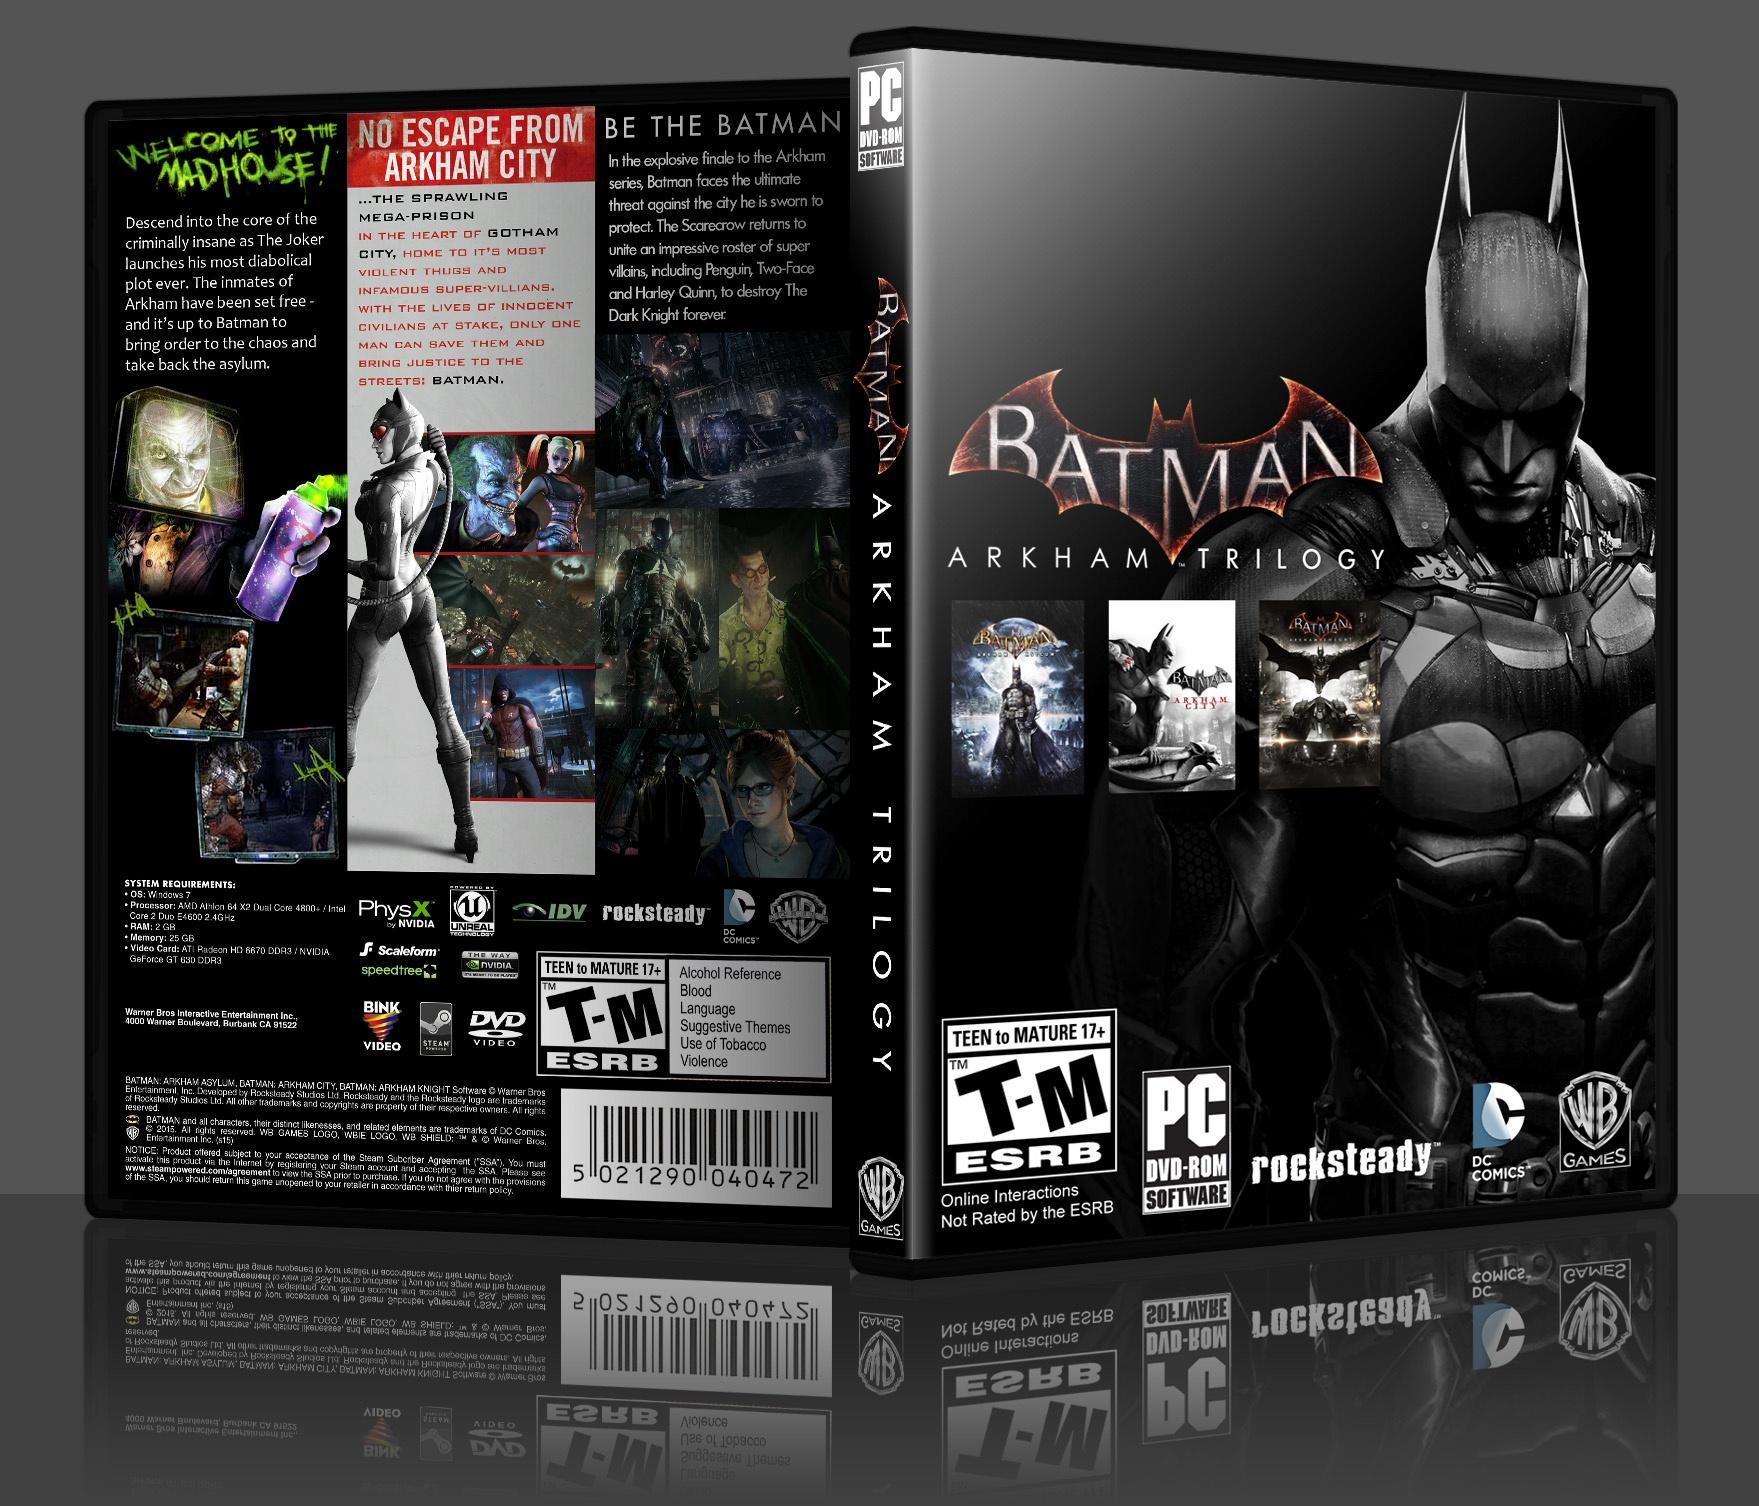 Batman Arkham Trilogy Pc Box Art Cover By Adam Salter